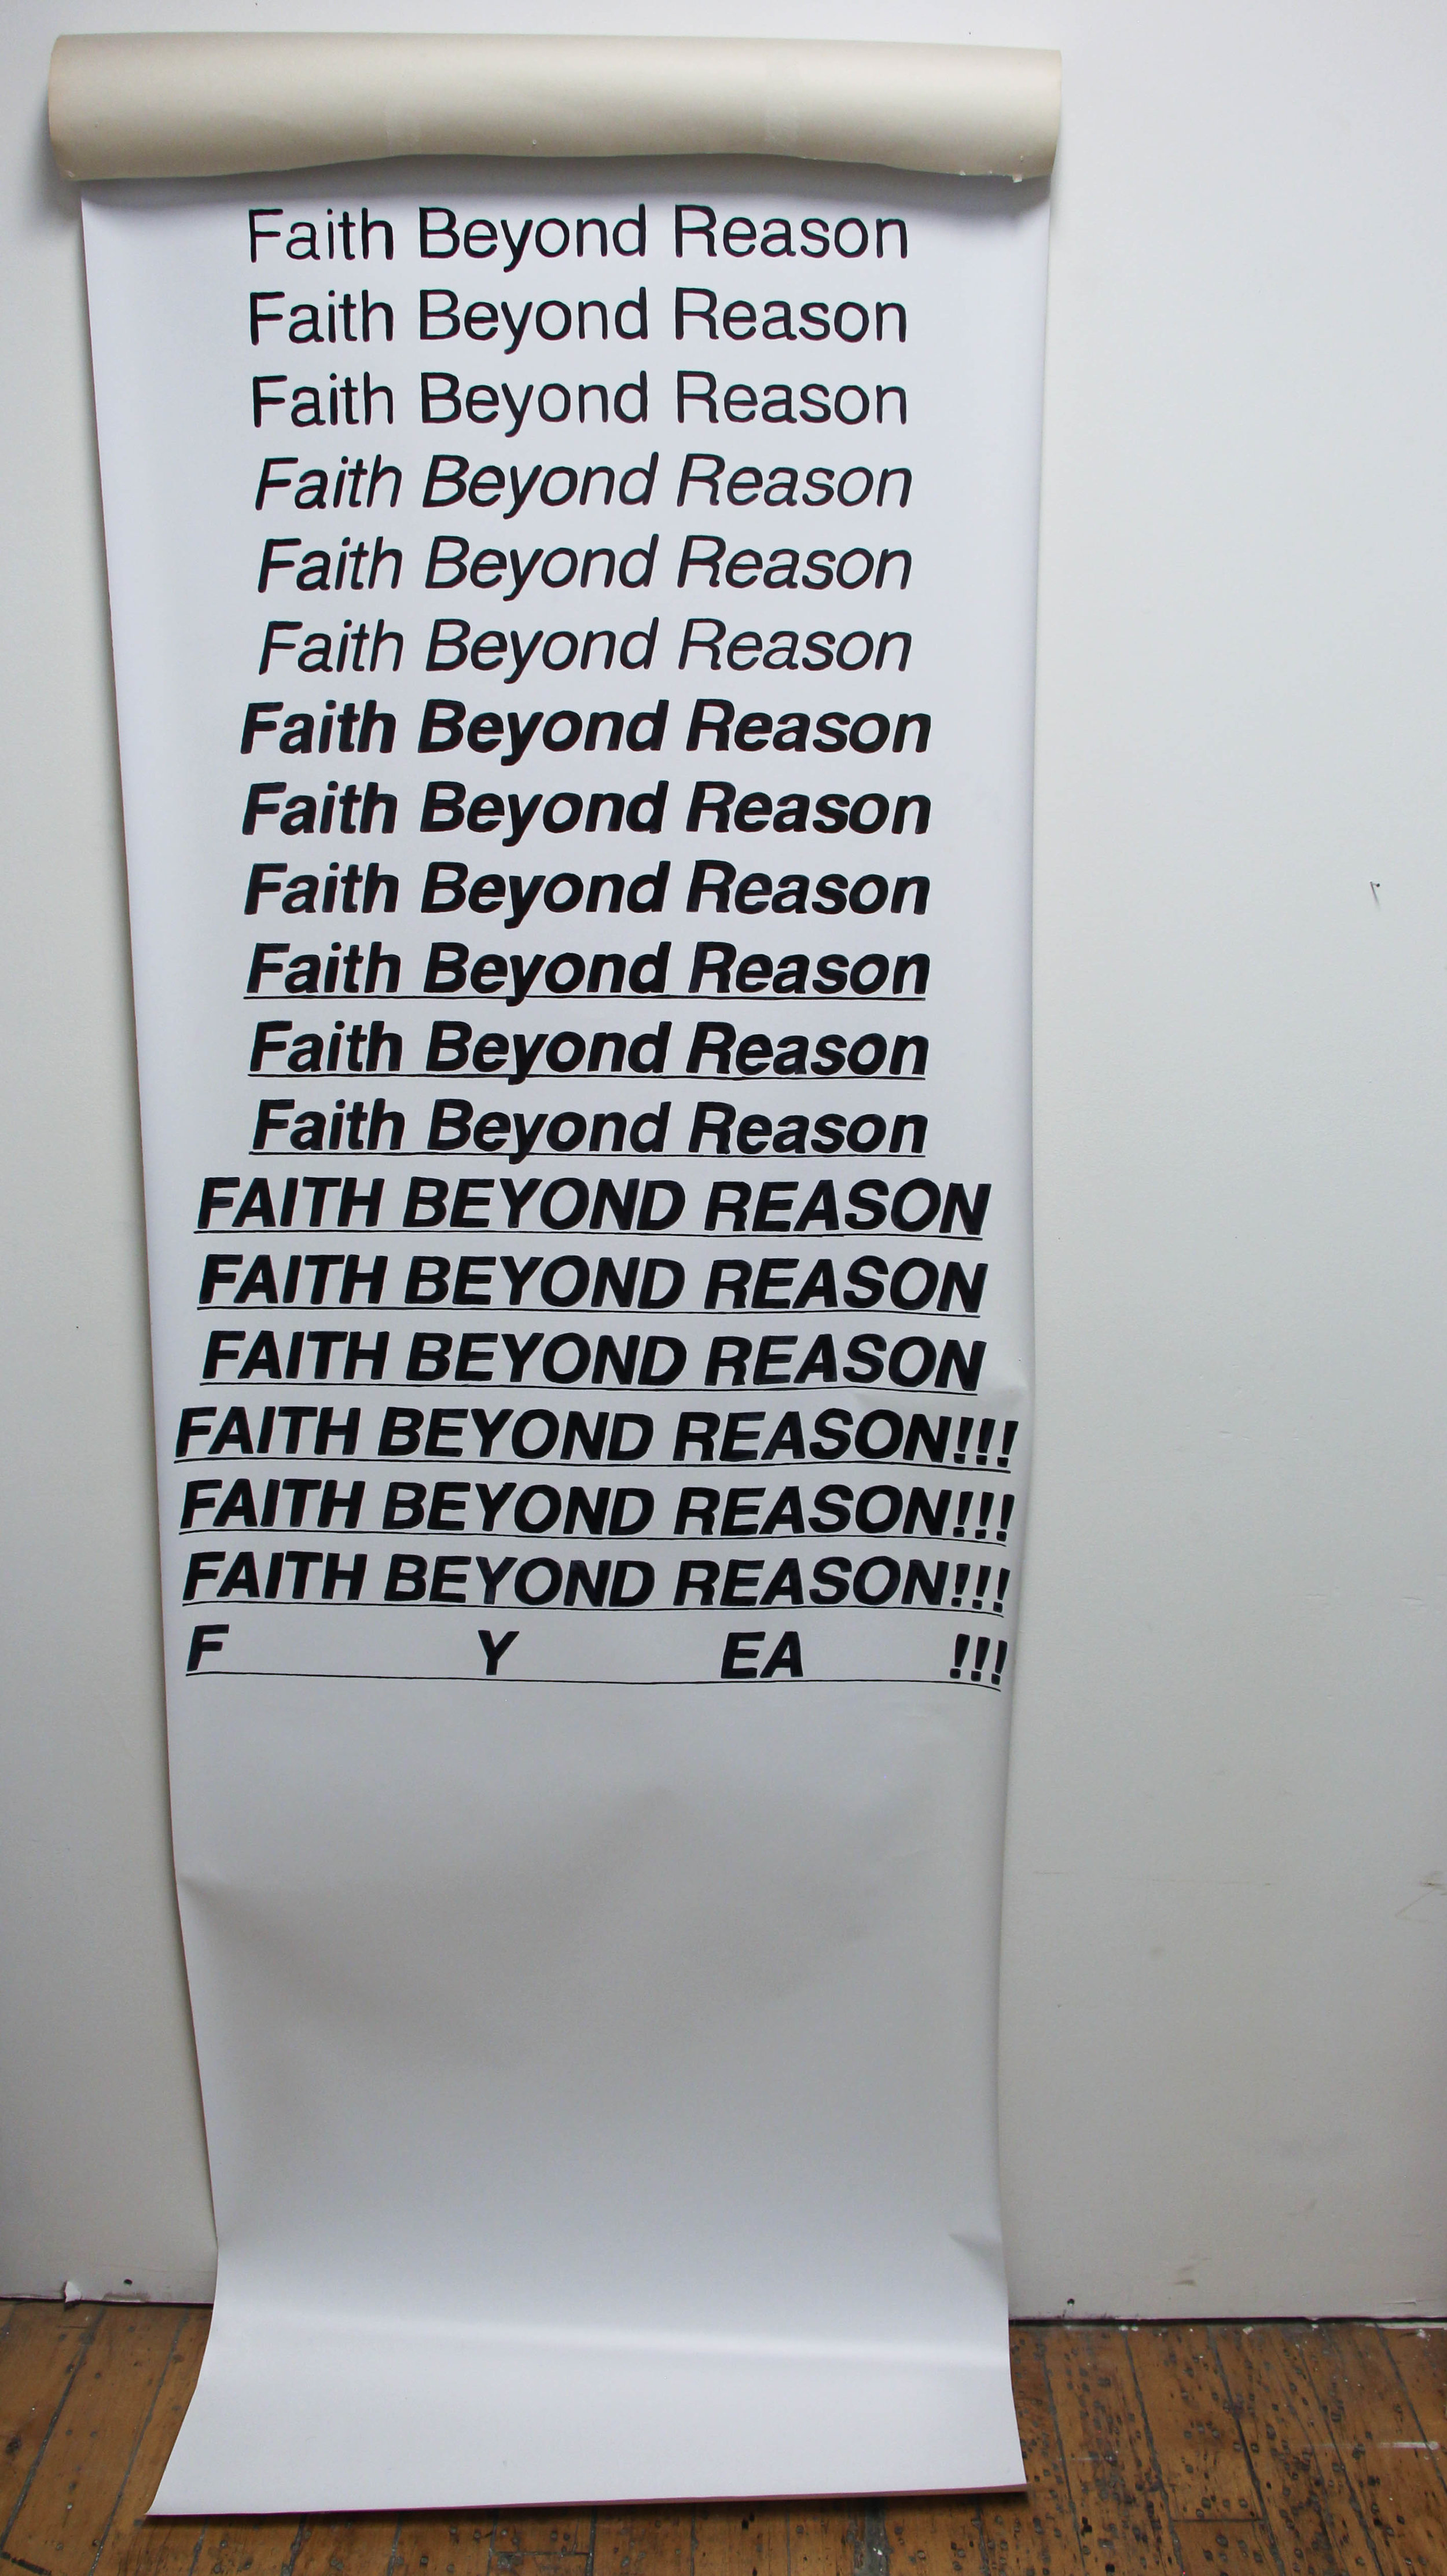 "Faith Beyond Reason (f yea!),  permanent marker on vinyl coated paper, 72"" x 30"" 2018"